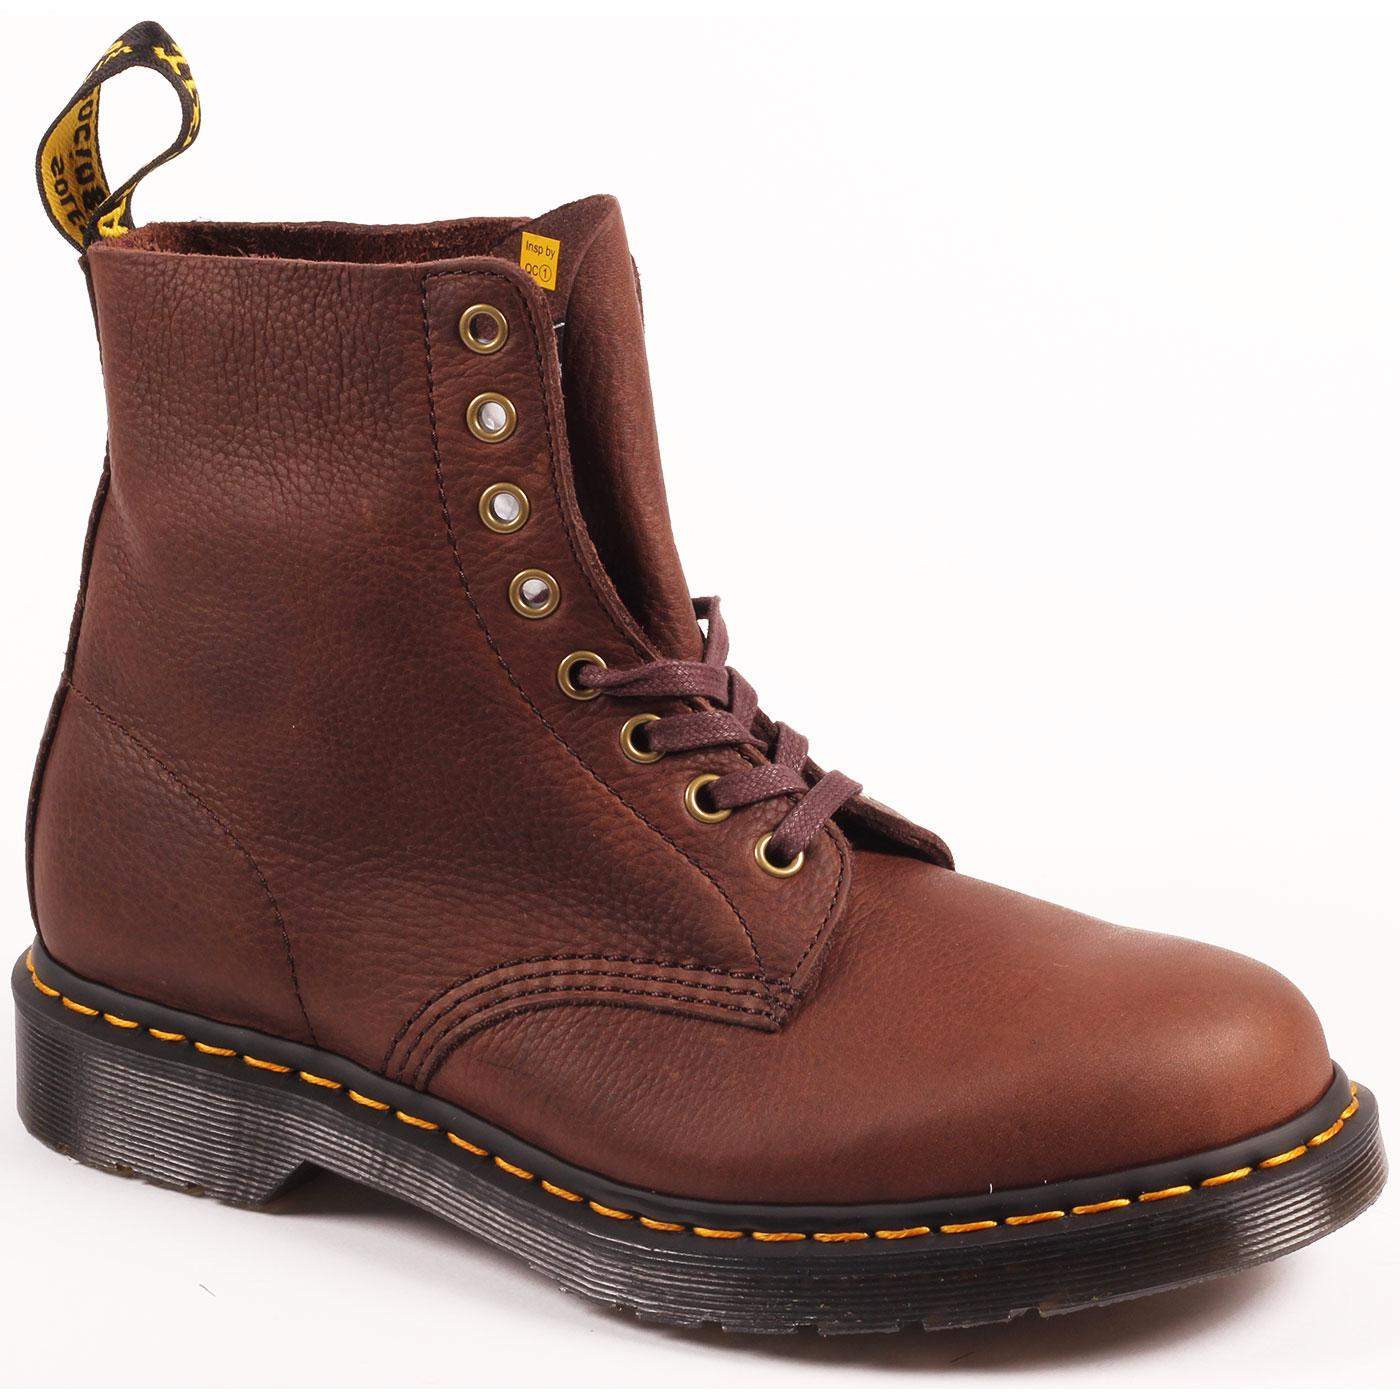 1460 Pascal DR MARTENS Mod Cask Ambassador Boots